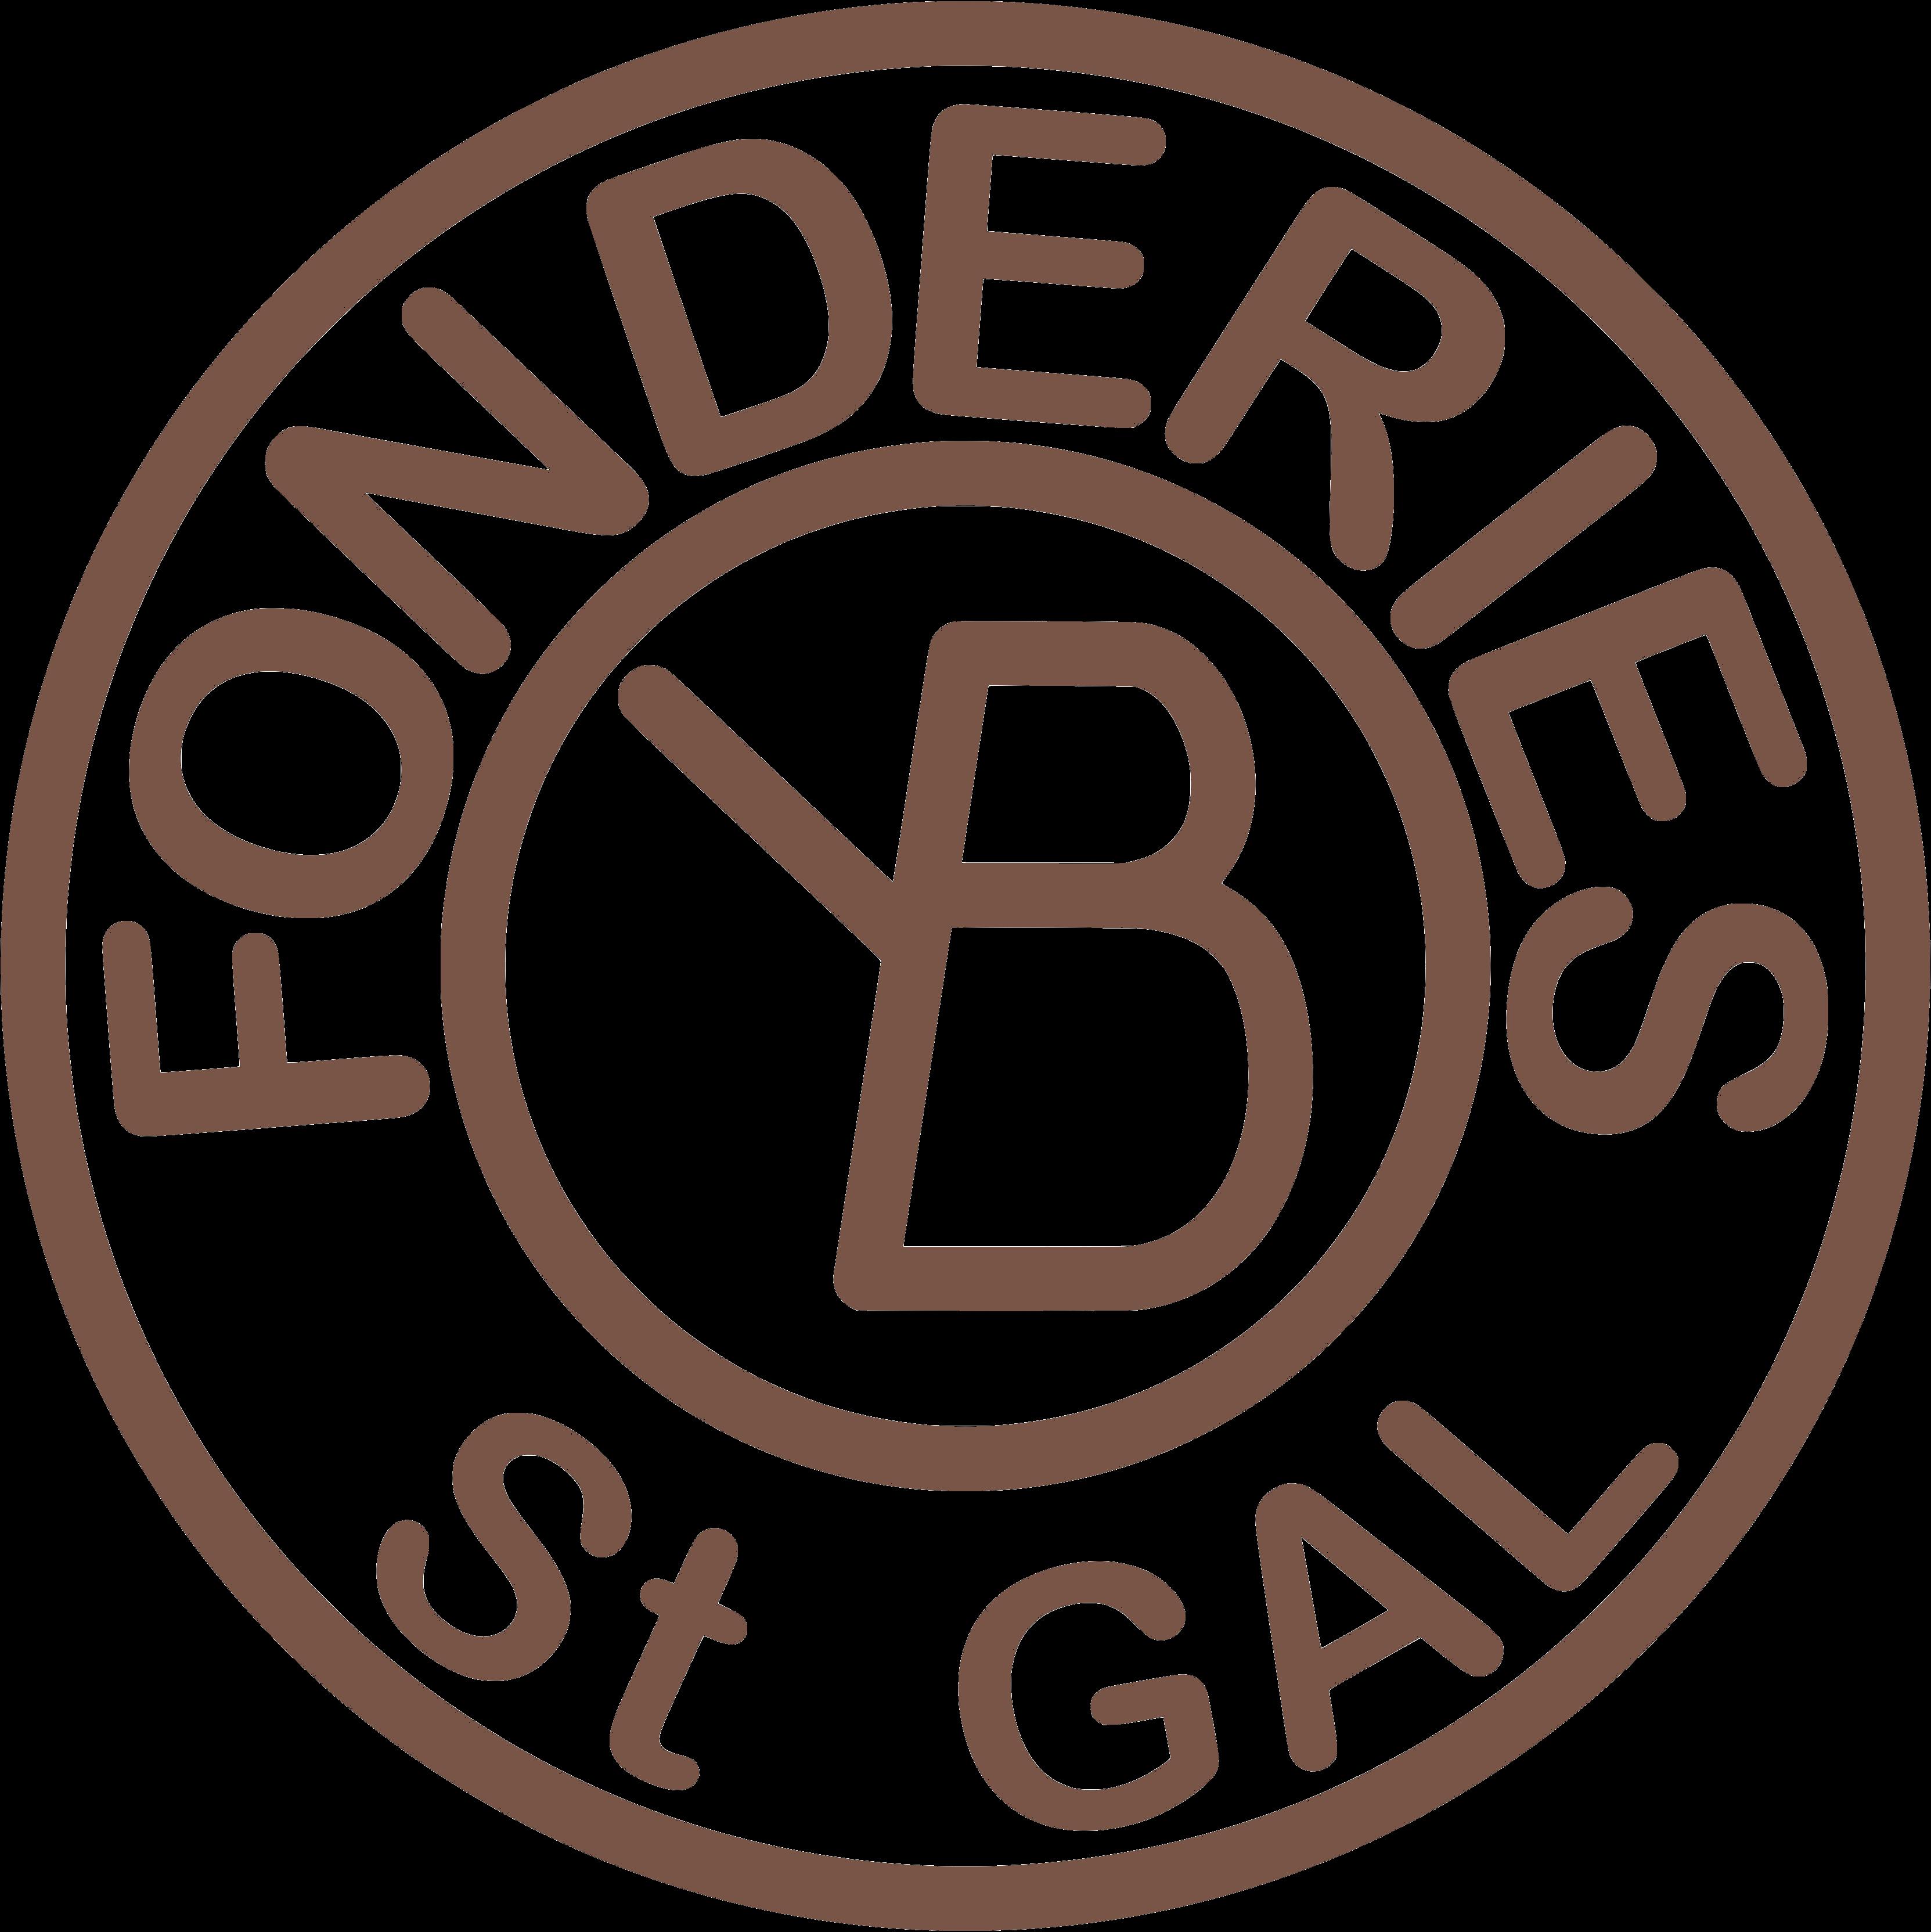 Les Fonderies de Saint Gal